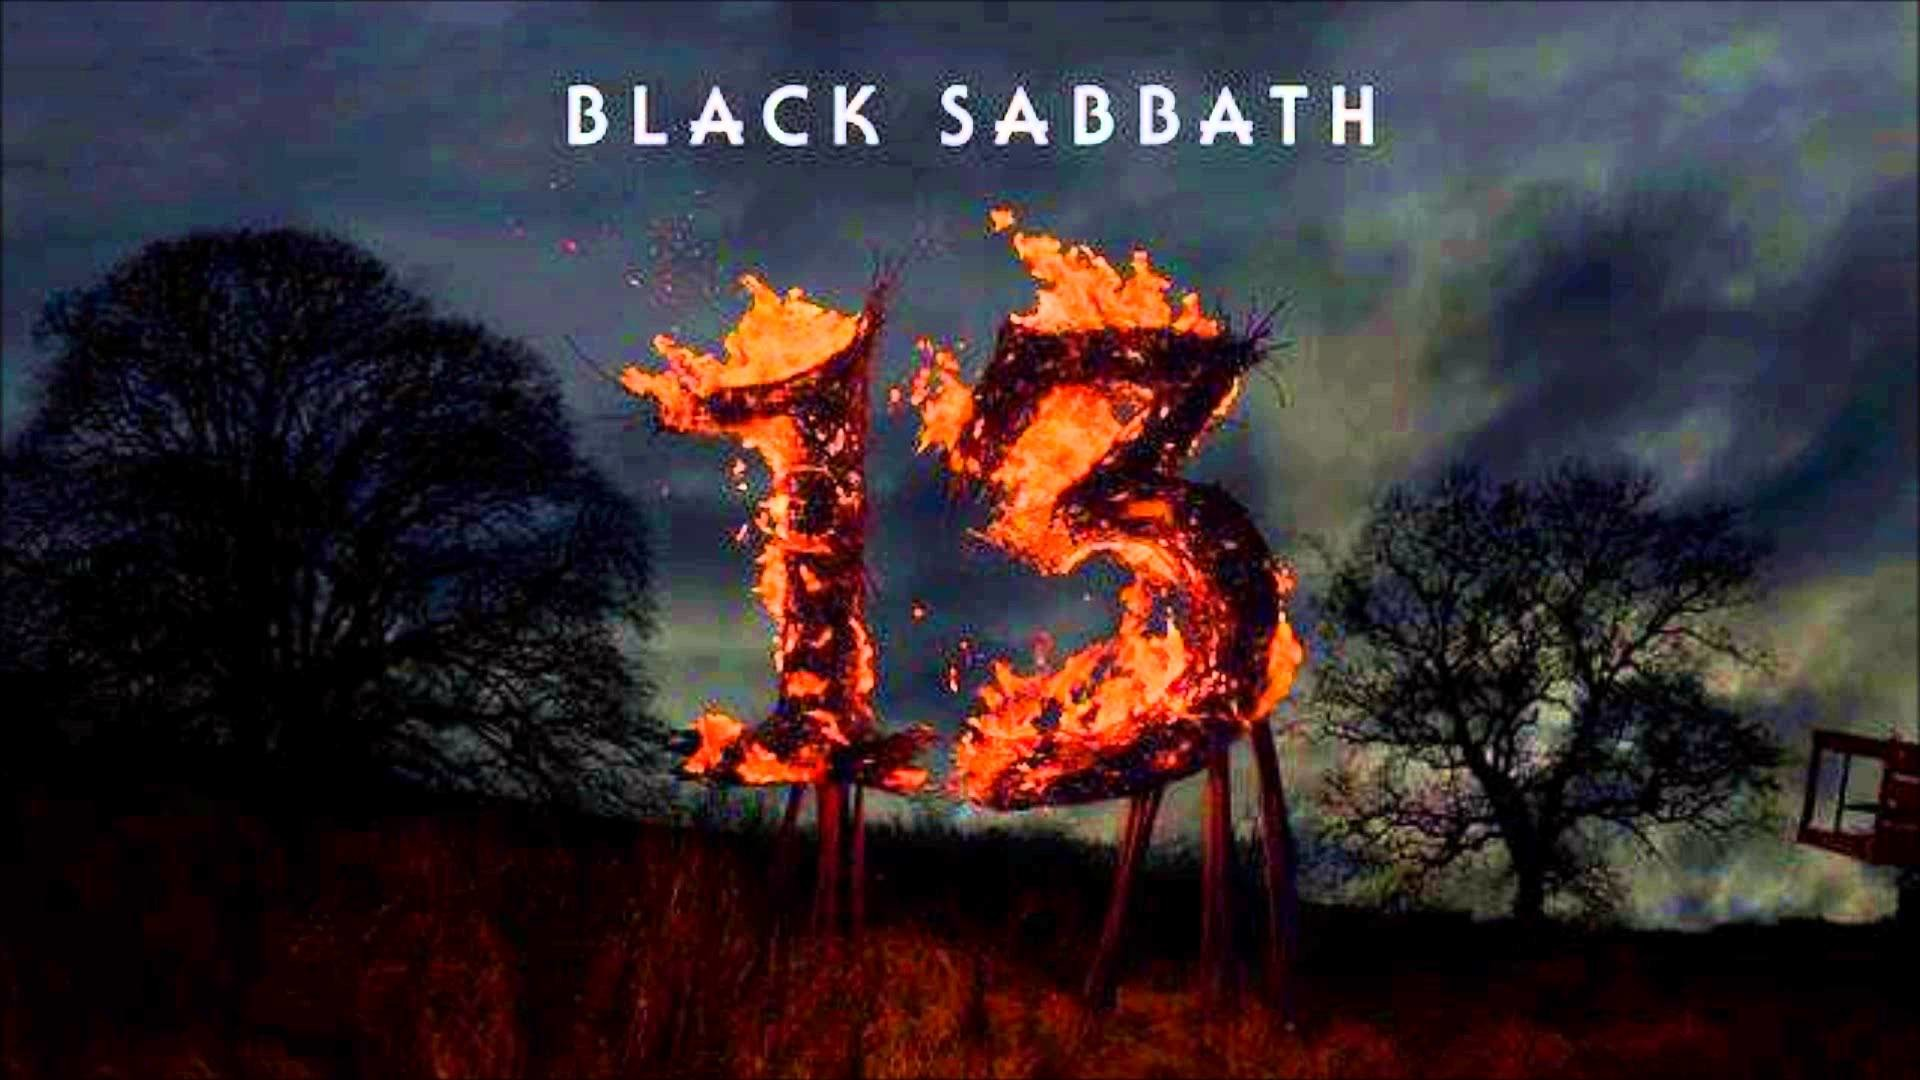 Black Sabbath – God Is Dead? (Lyrics)